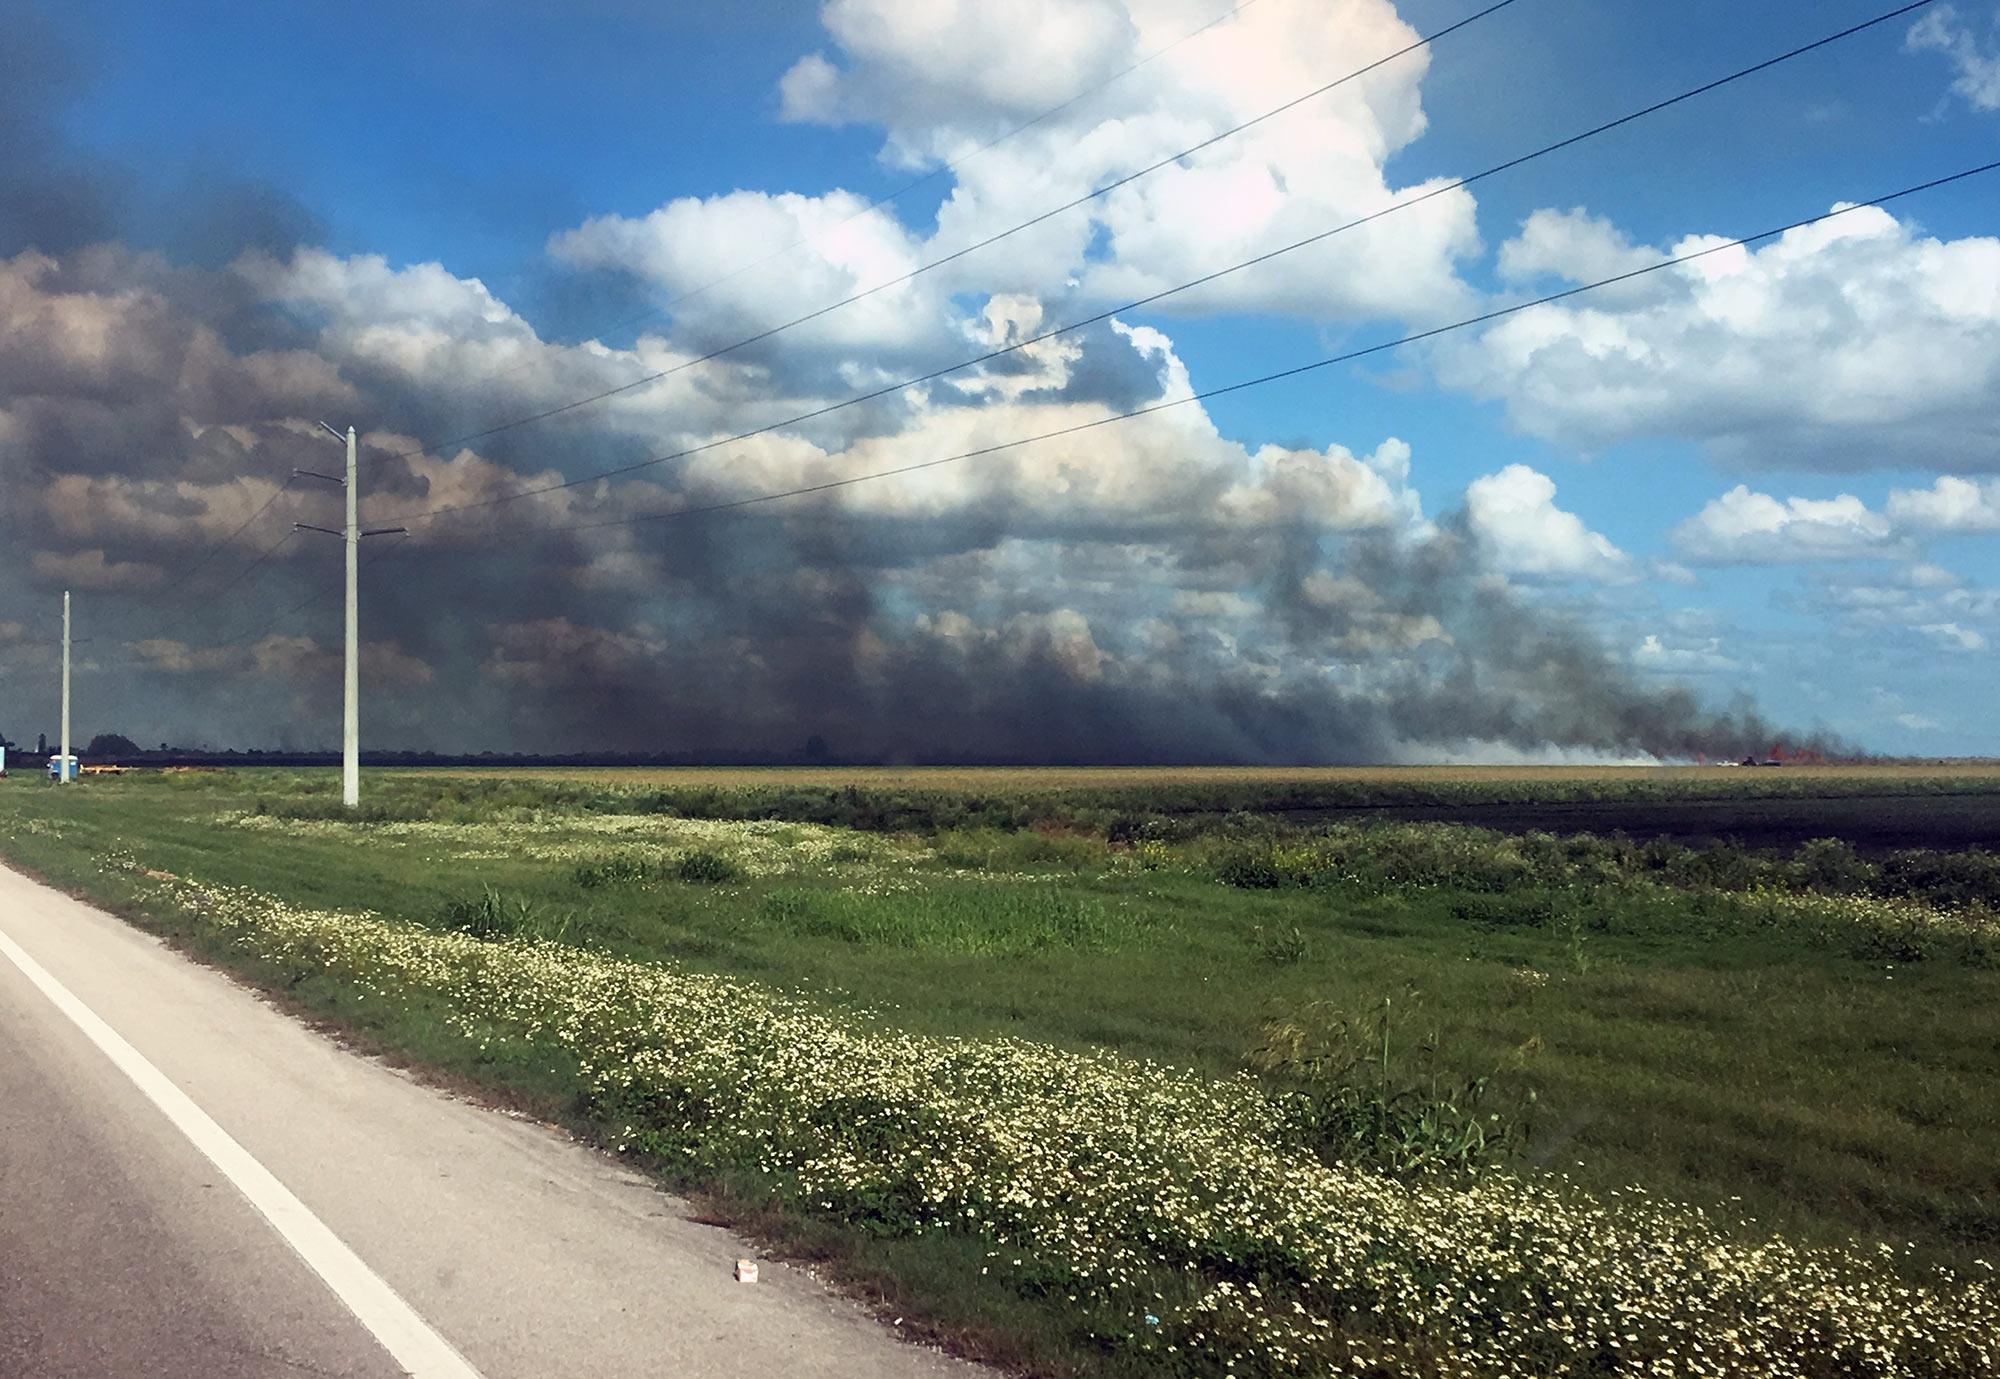 Smoke from a sugarcane burn darkens a clear sky near South Bay.